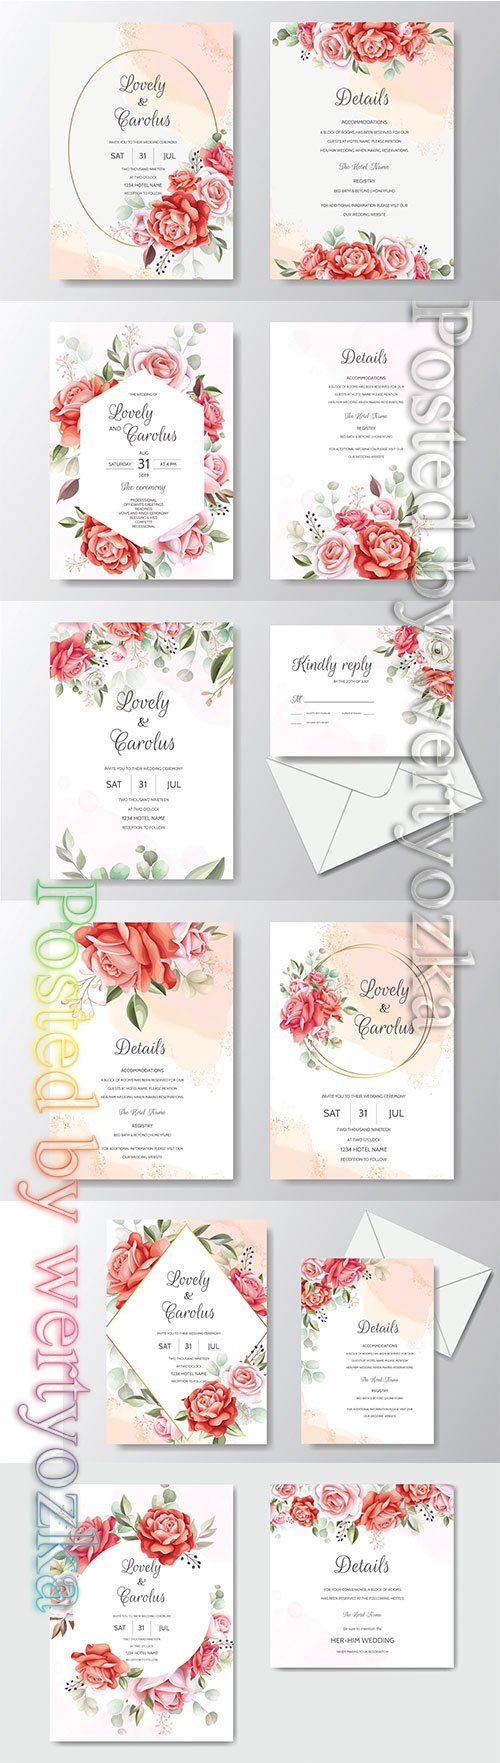 Beautiful floral wreath wedding invitation card template # 5